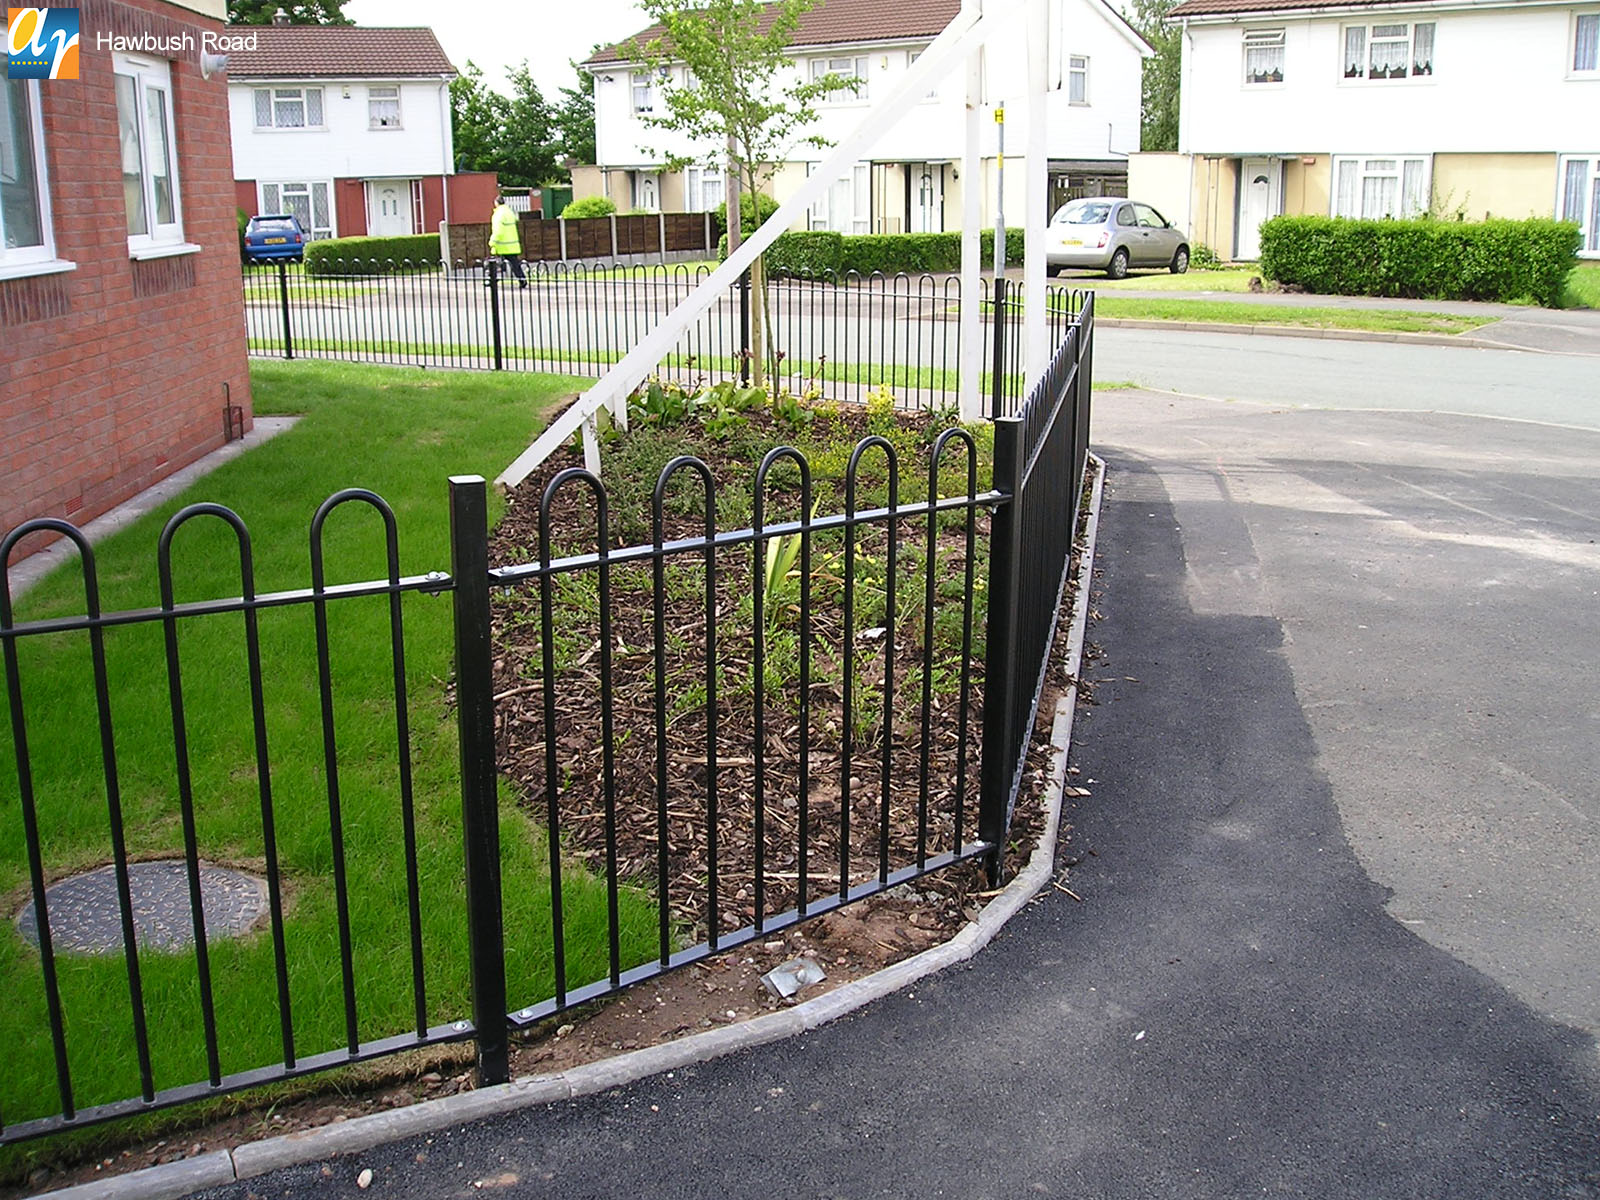 Hawbush Road standard bow top railings